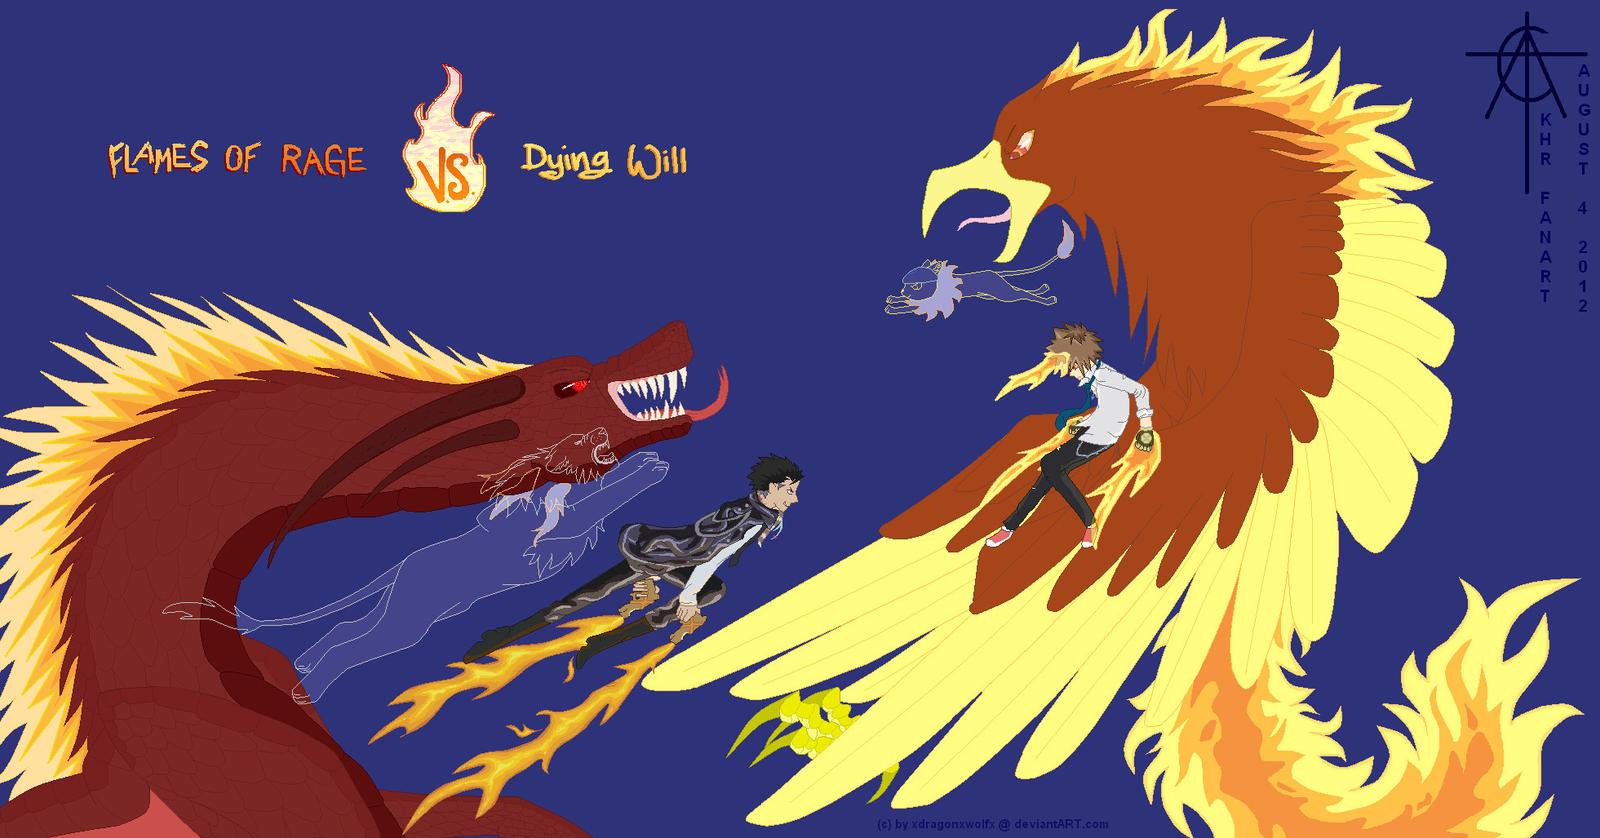 Fanart Khr Xanxus Vs Tsuna Sky Ring Battle By Xdragonxwolfx